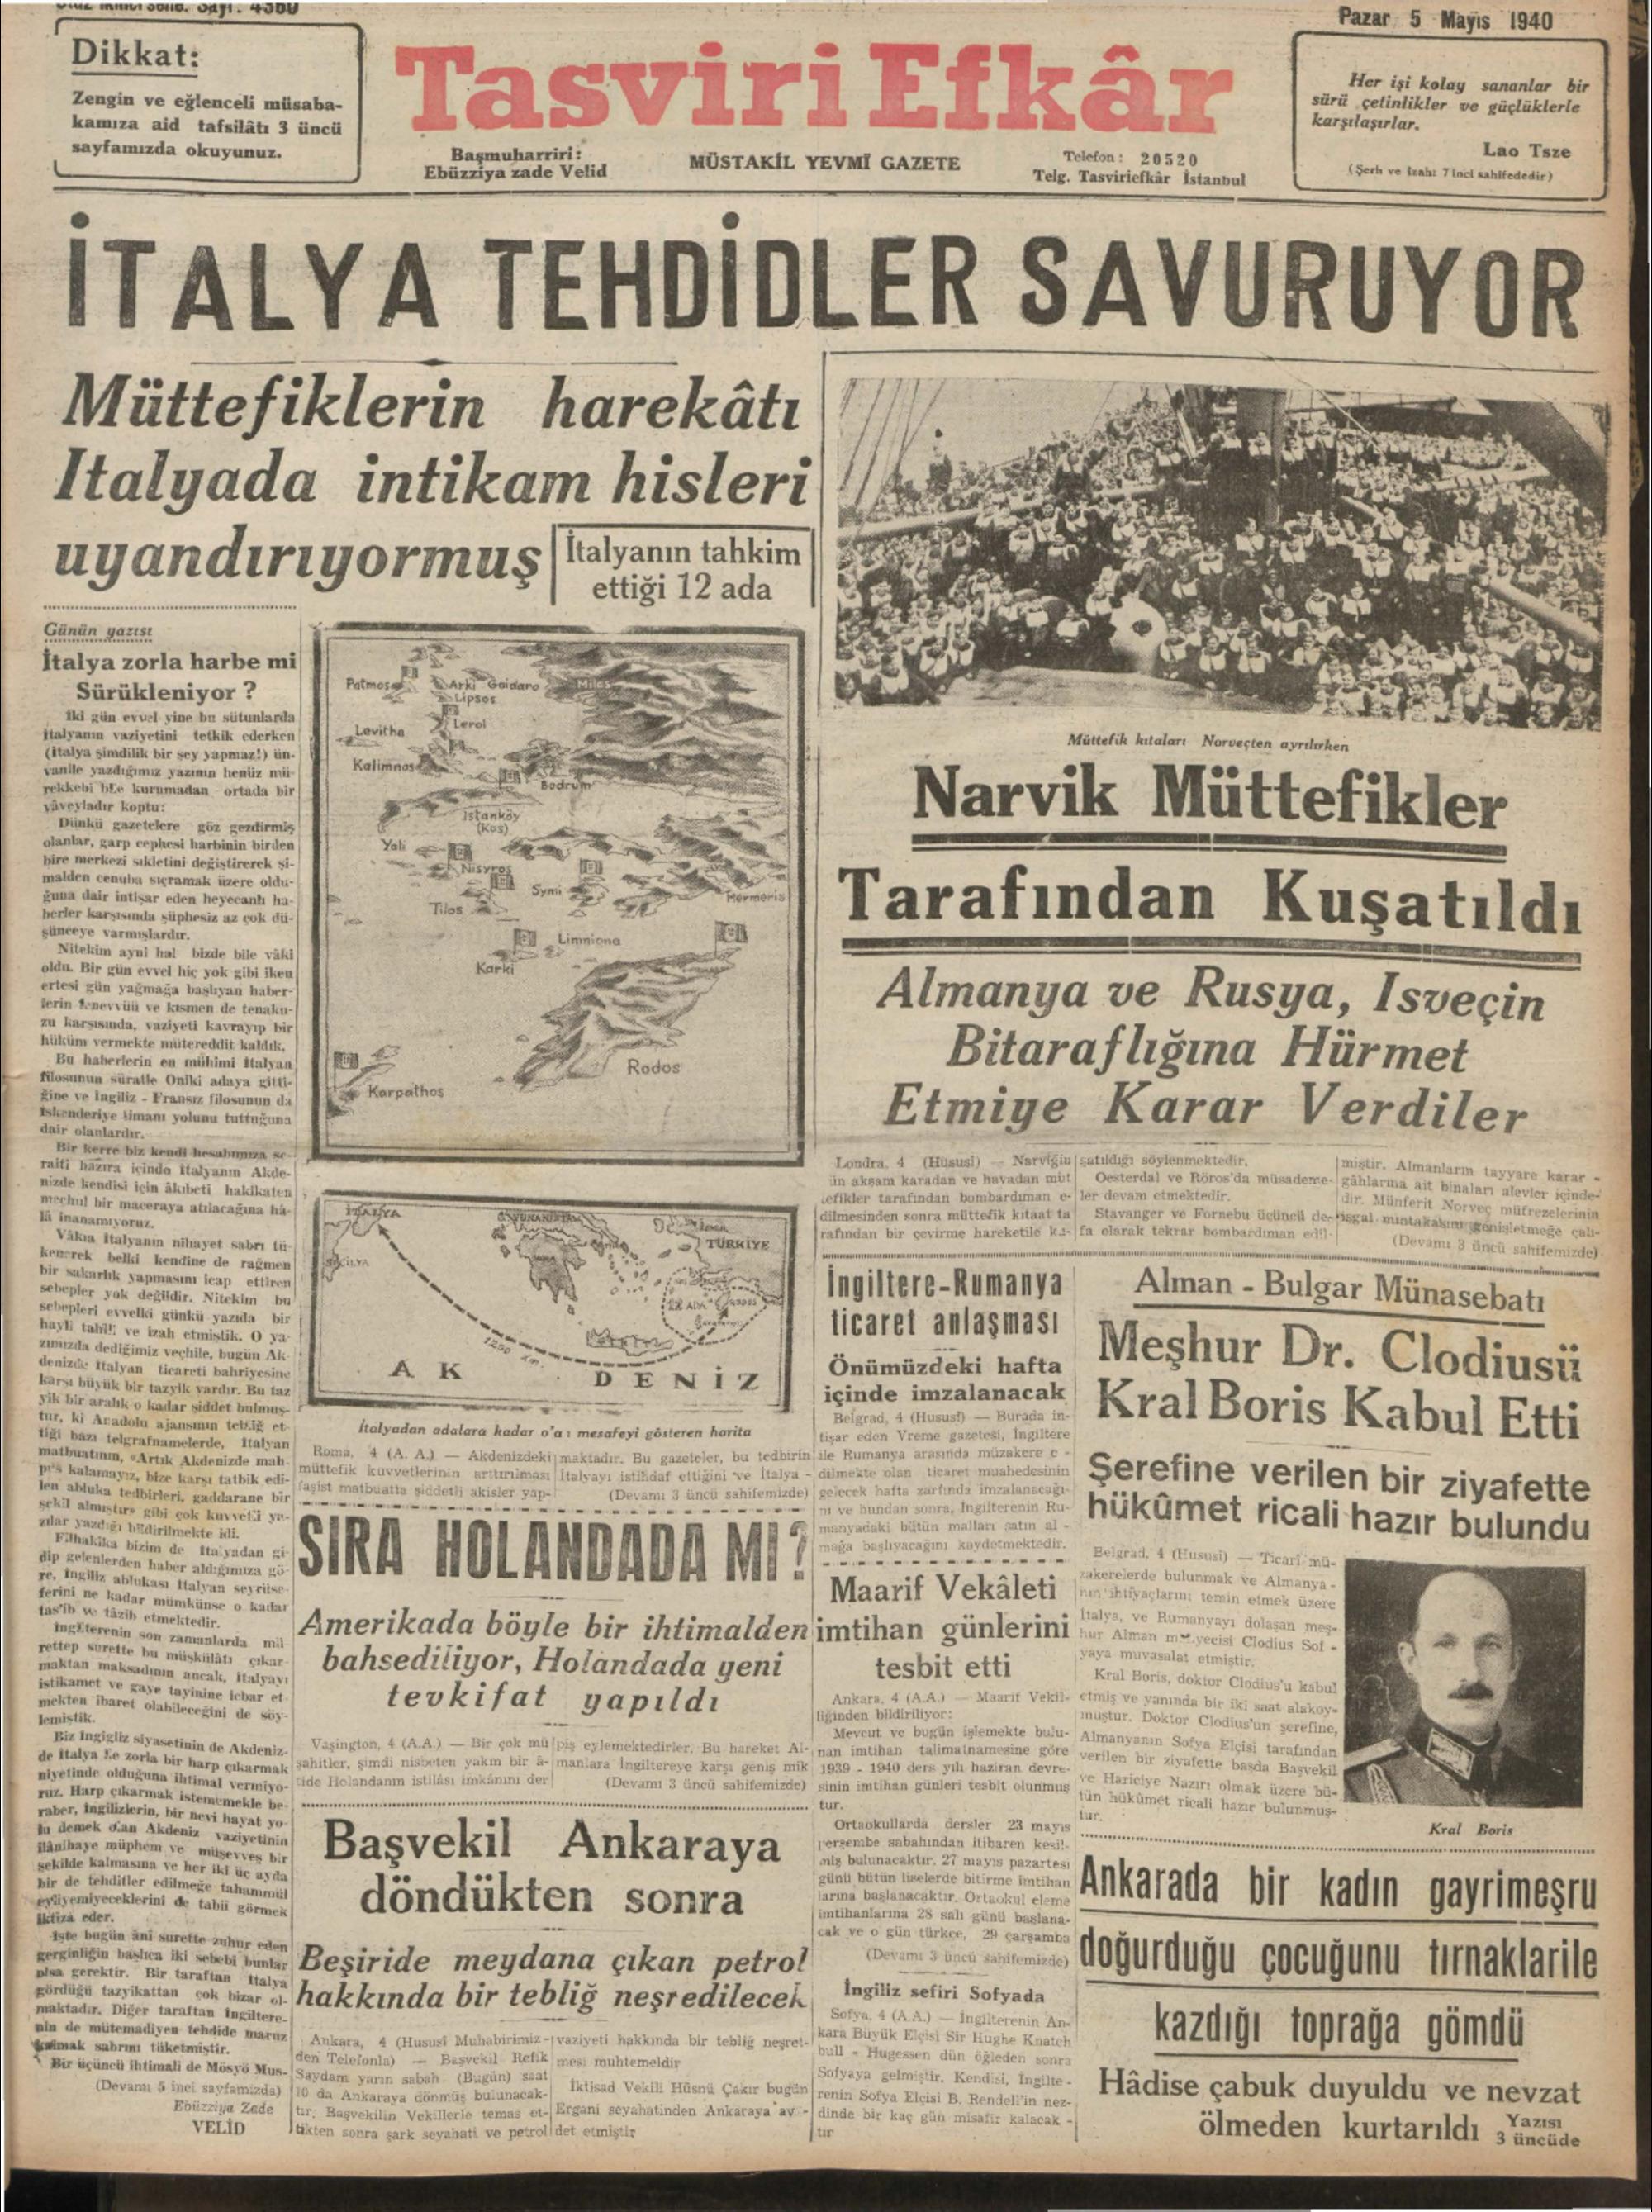 5 Mayıs 1940 Tarihli Tasviri Efkar Gazetesi Sayfa 1